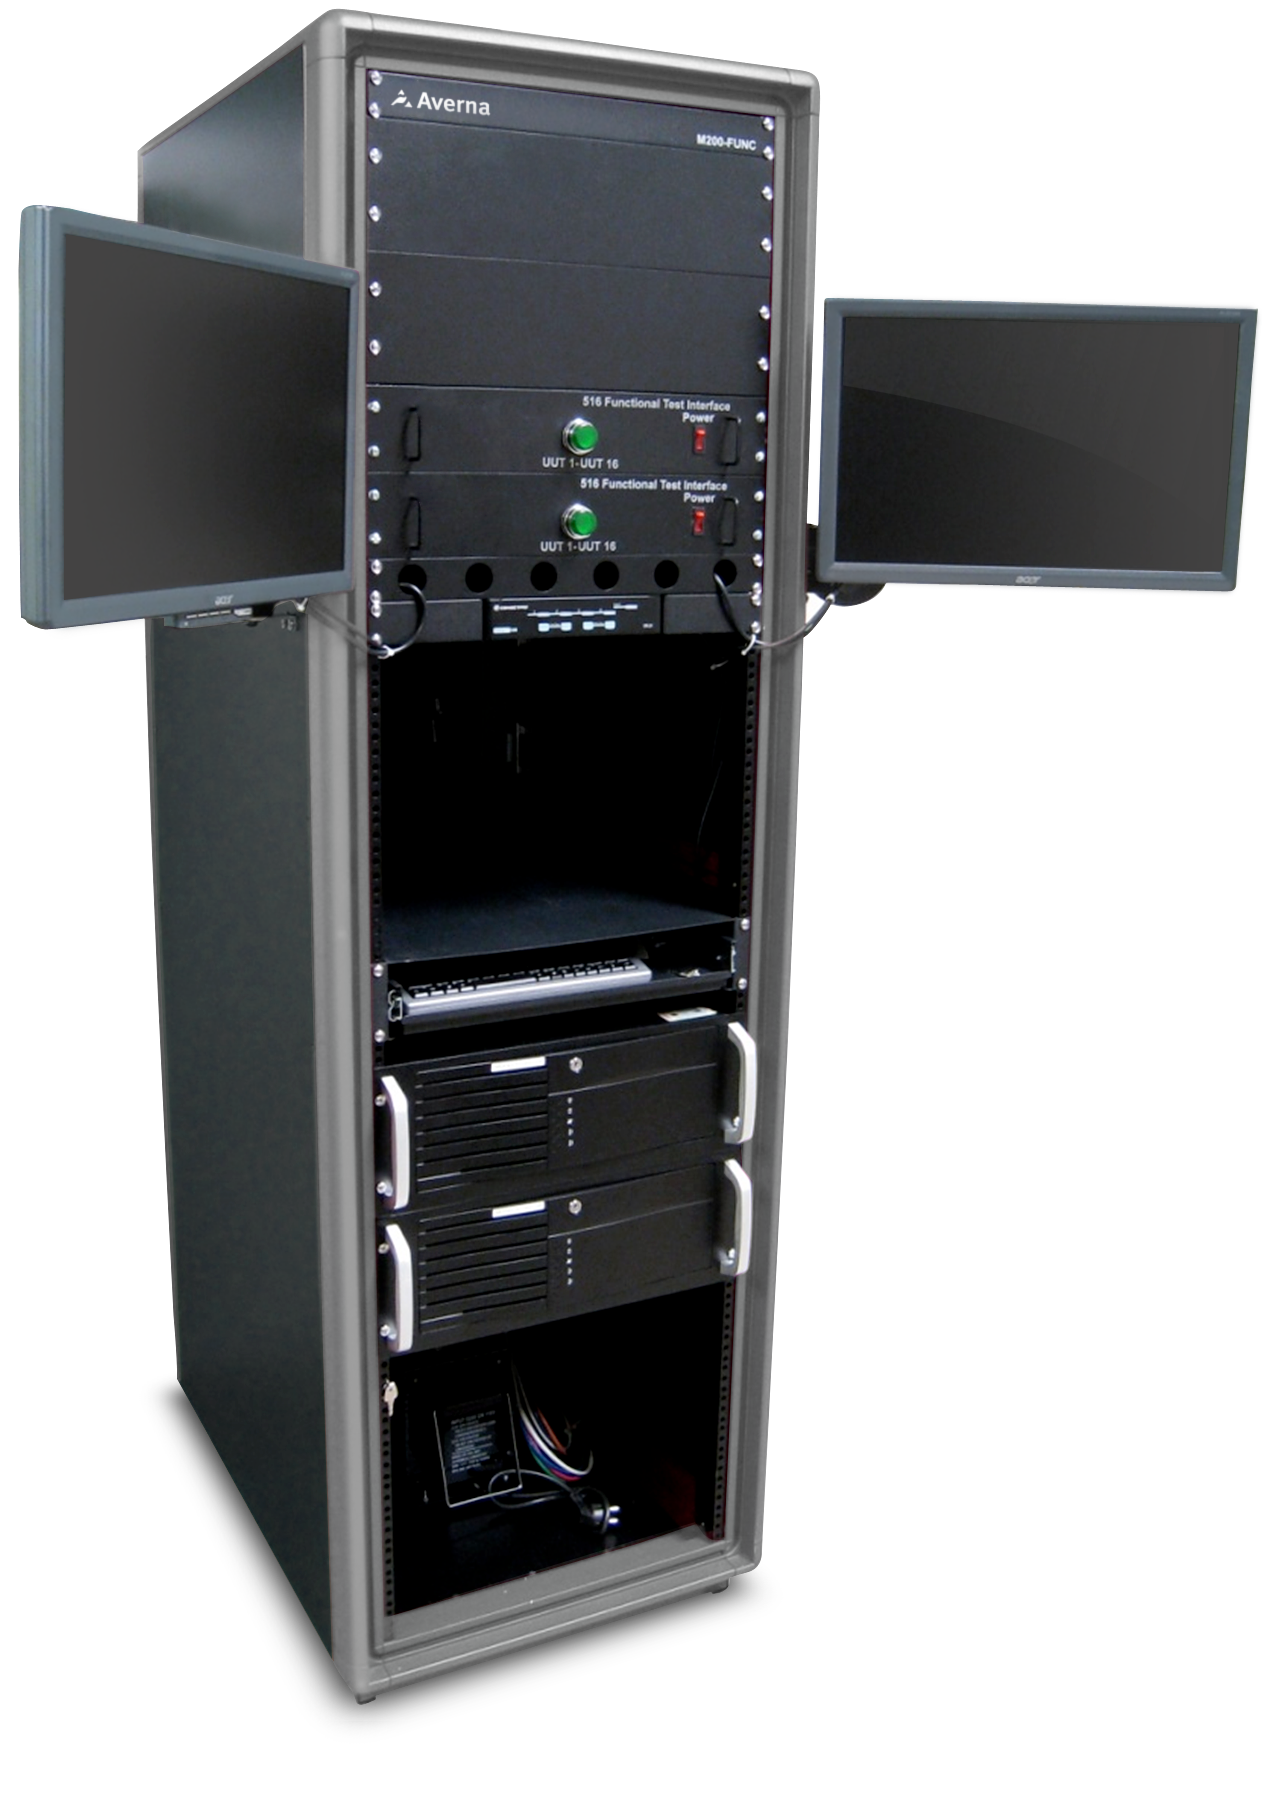 Mercury Manufacturing Verification Test System